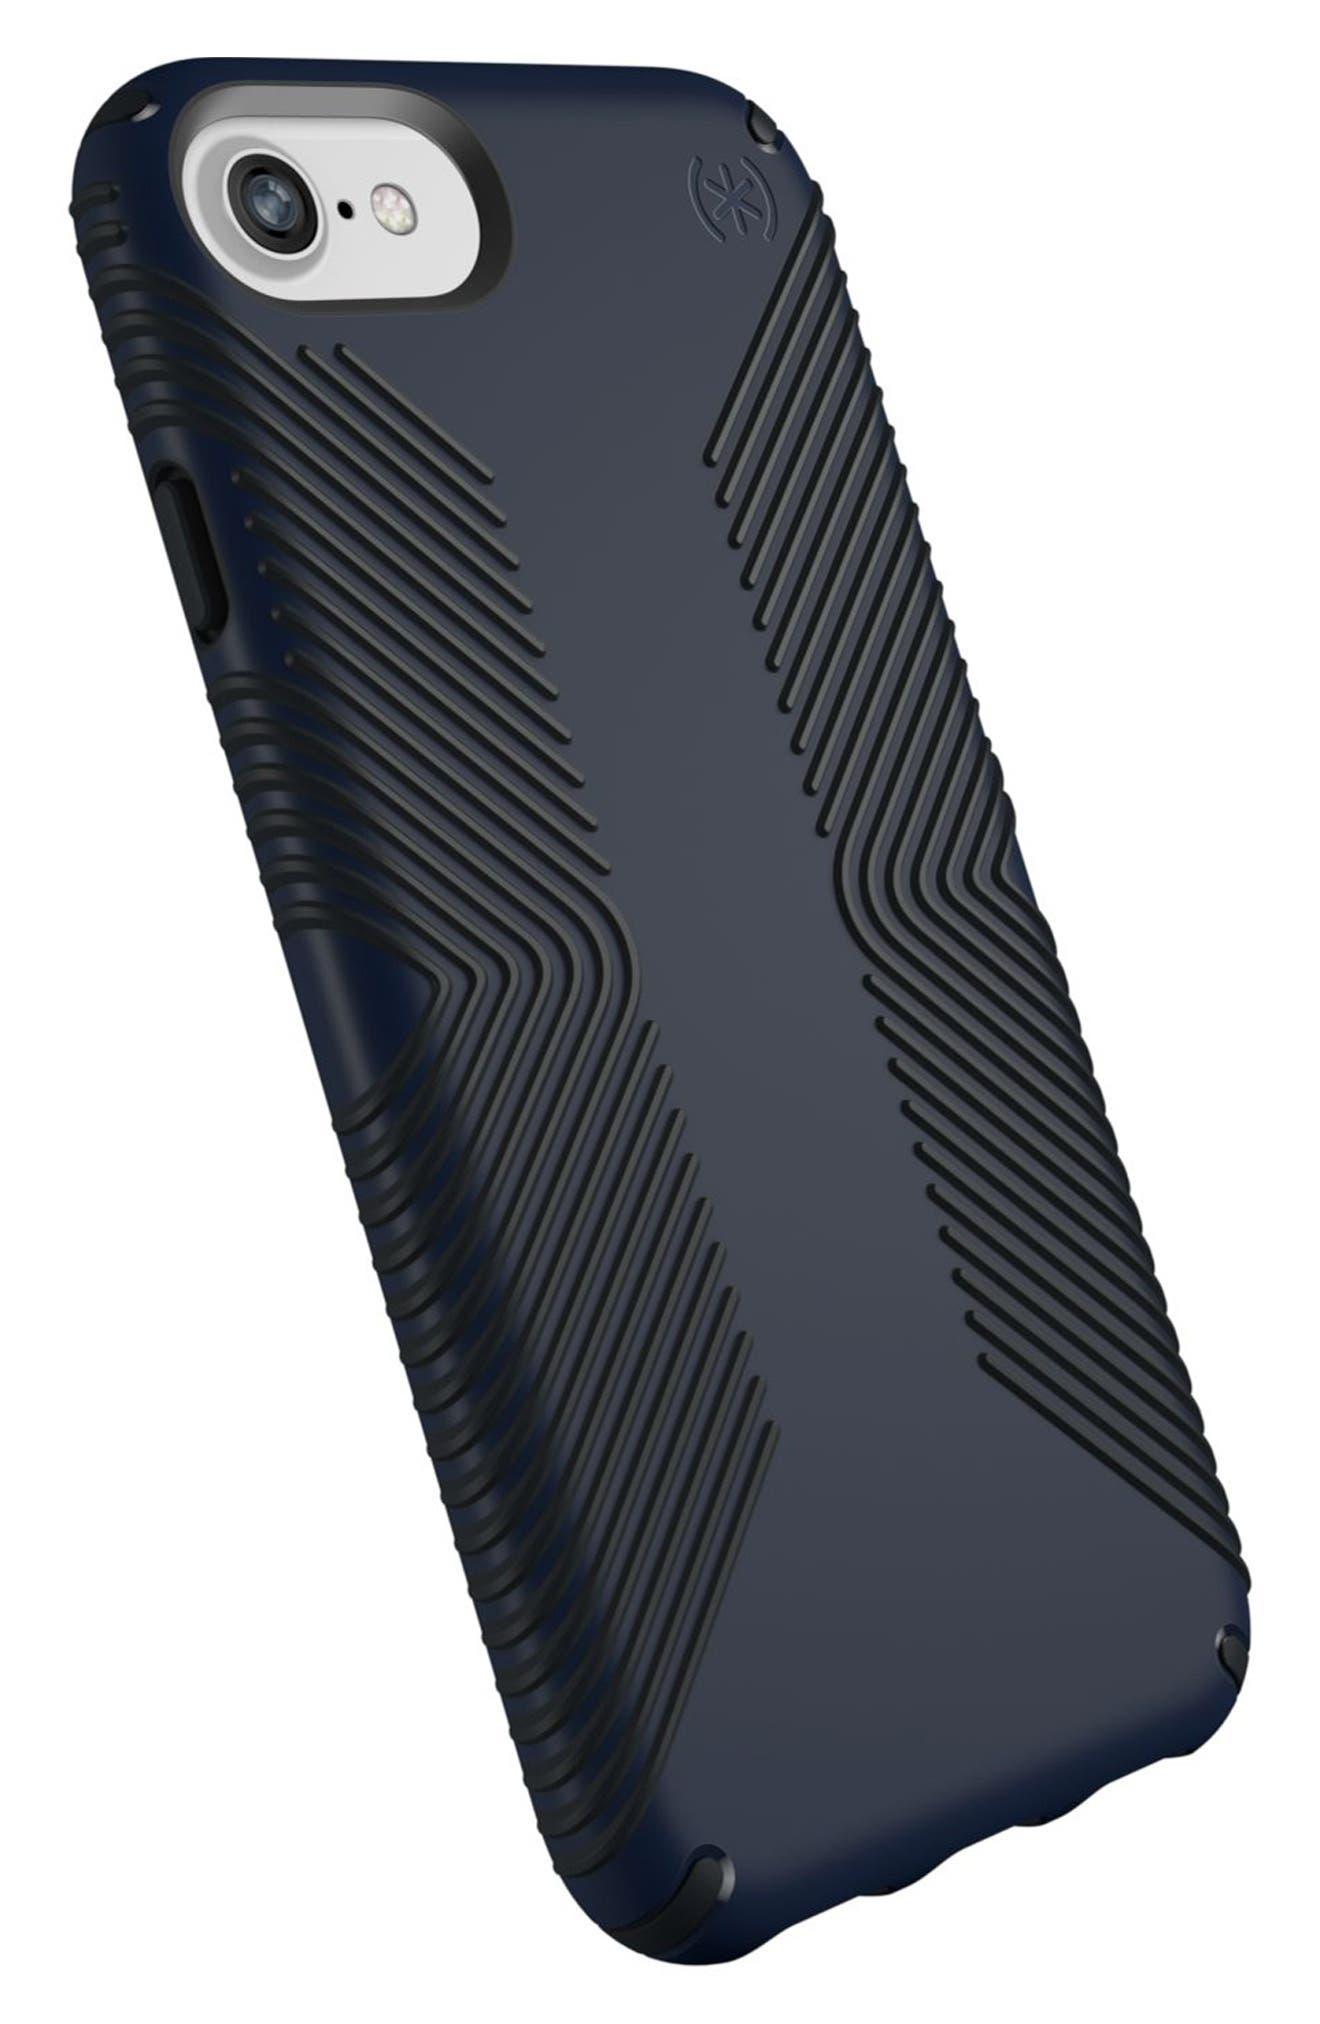 Grip iPhone 6/6s/7/8 Case,                             Alternate thumbnail 7, color,                             400